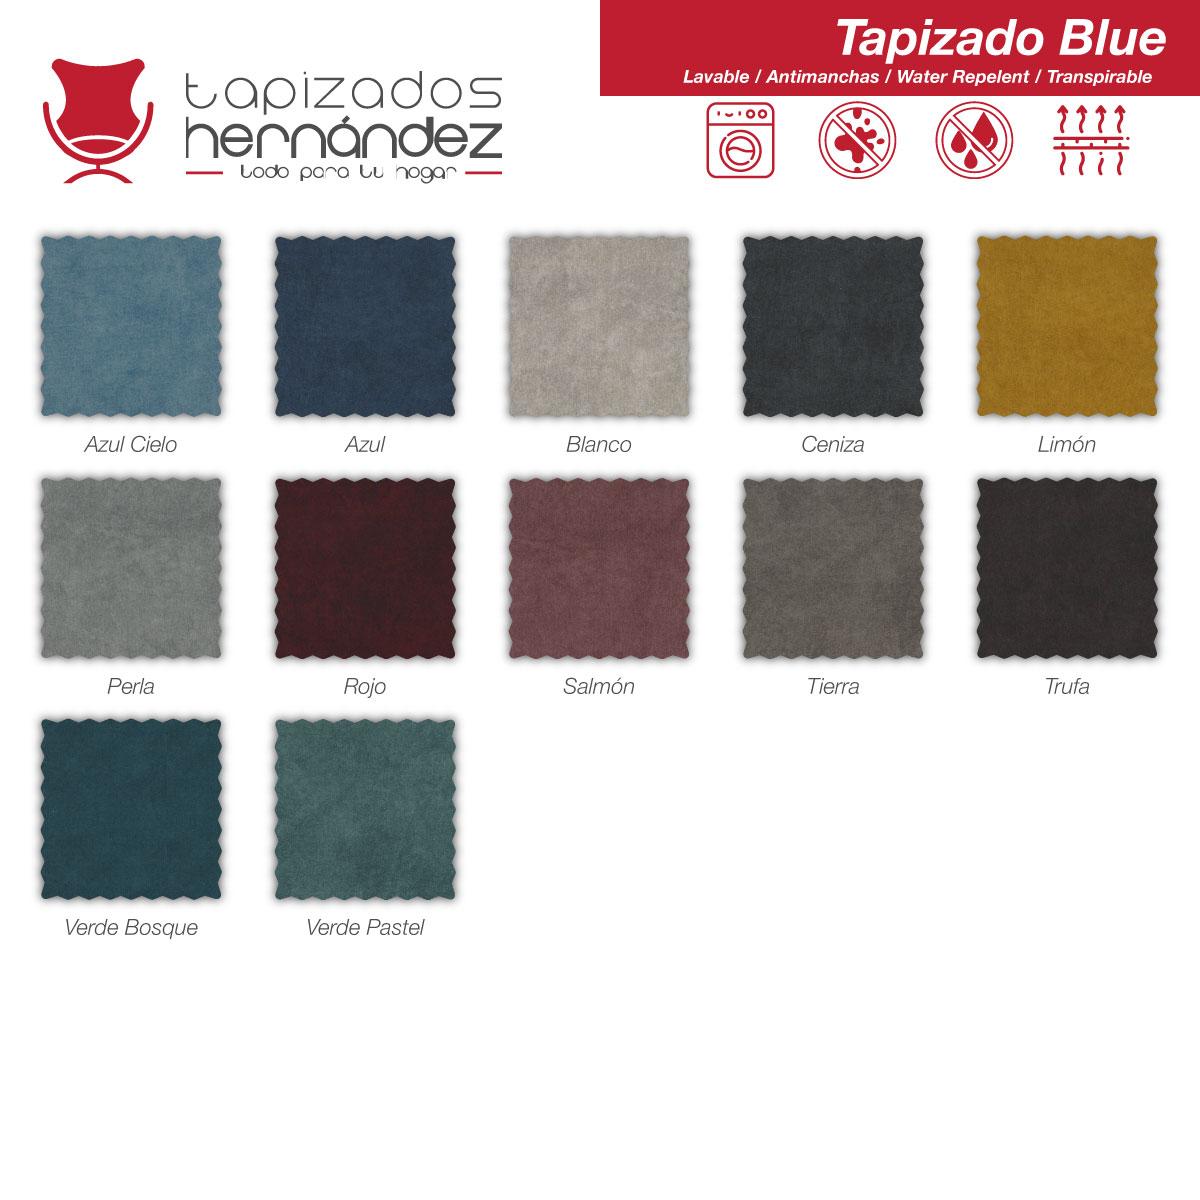 tapizado blue